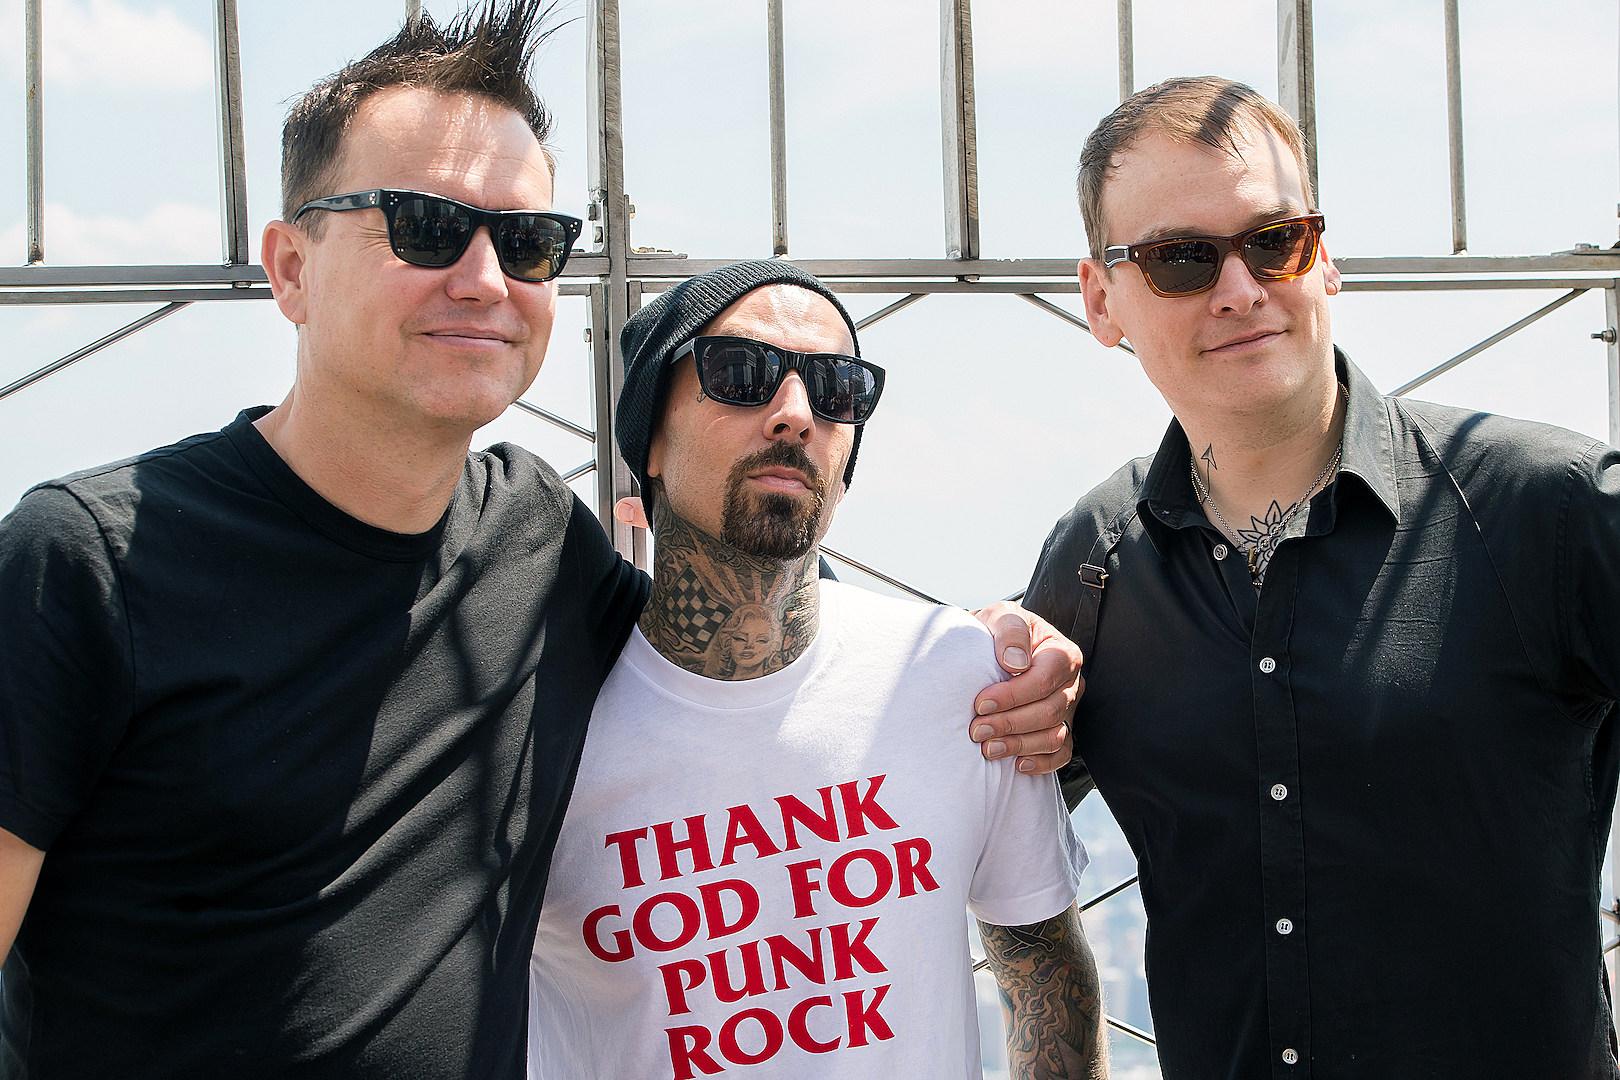 Blink-182 Confirm Album Release Date on 'Good Morning America'